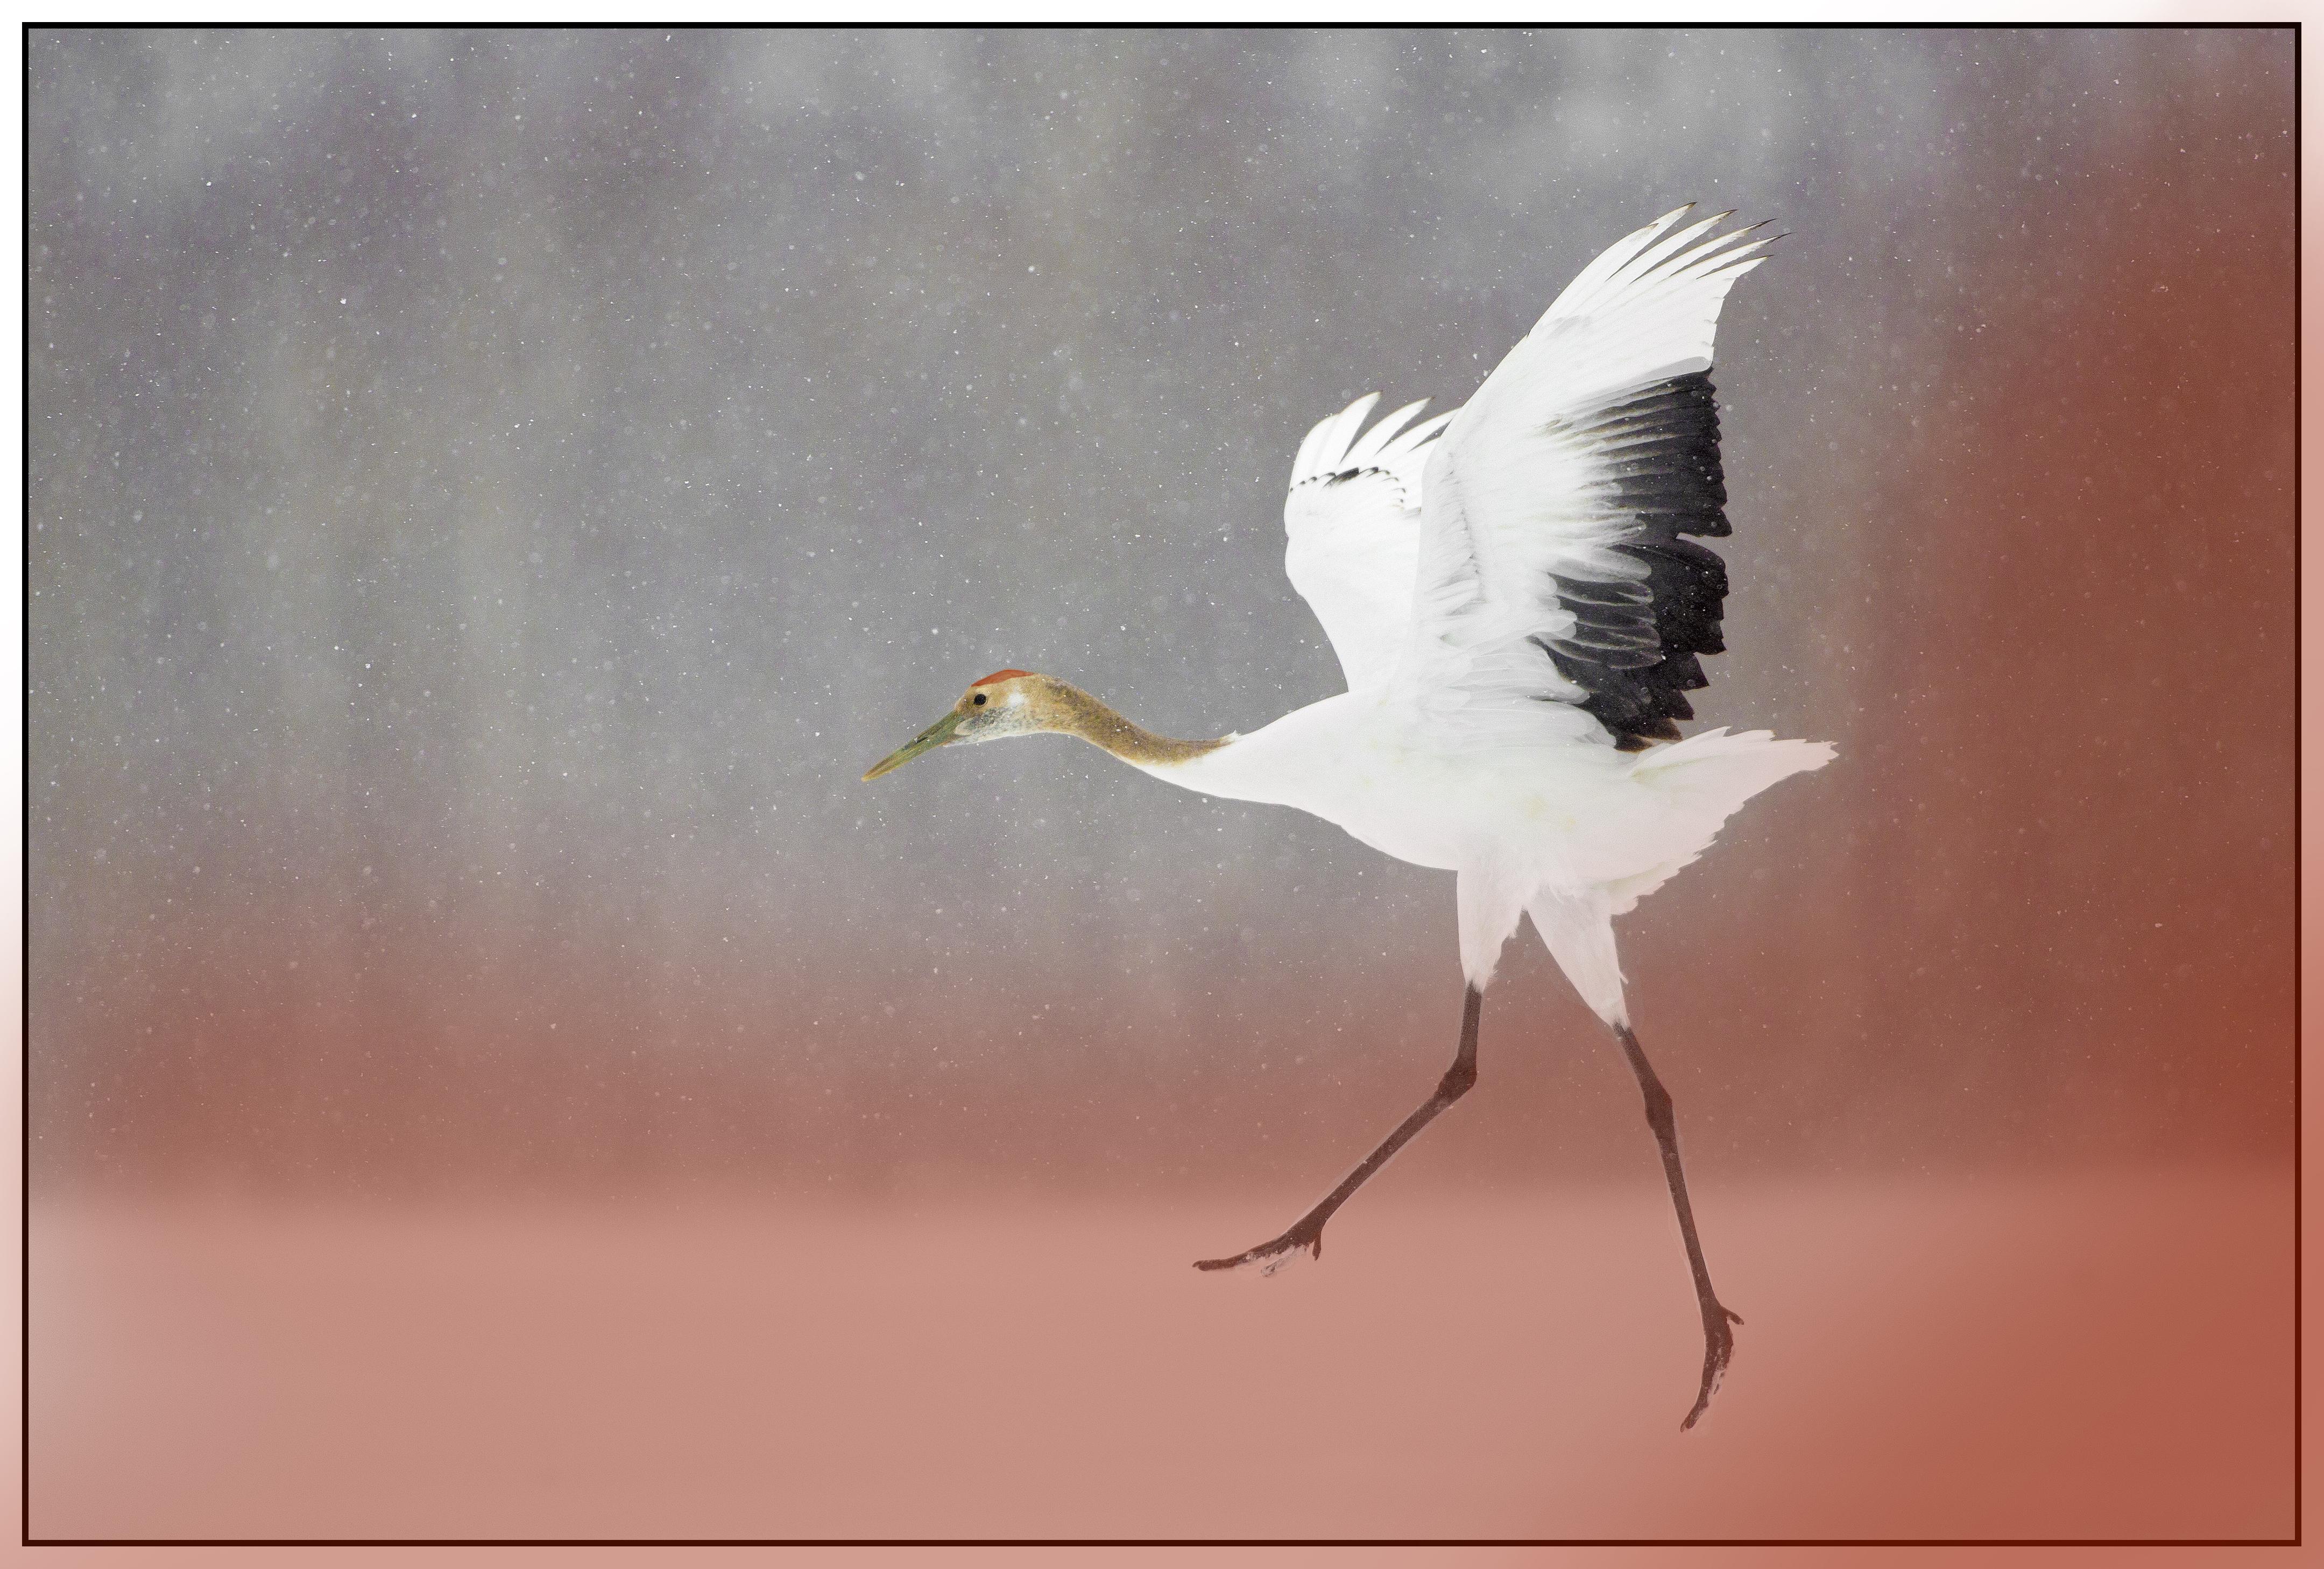 image of a crane